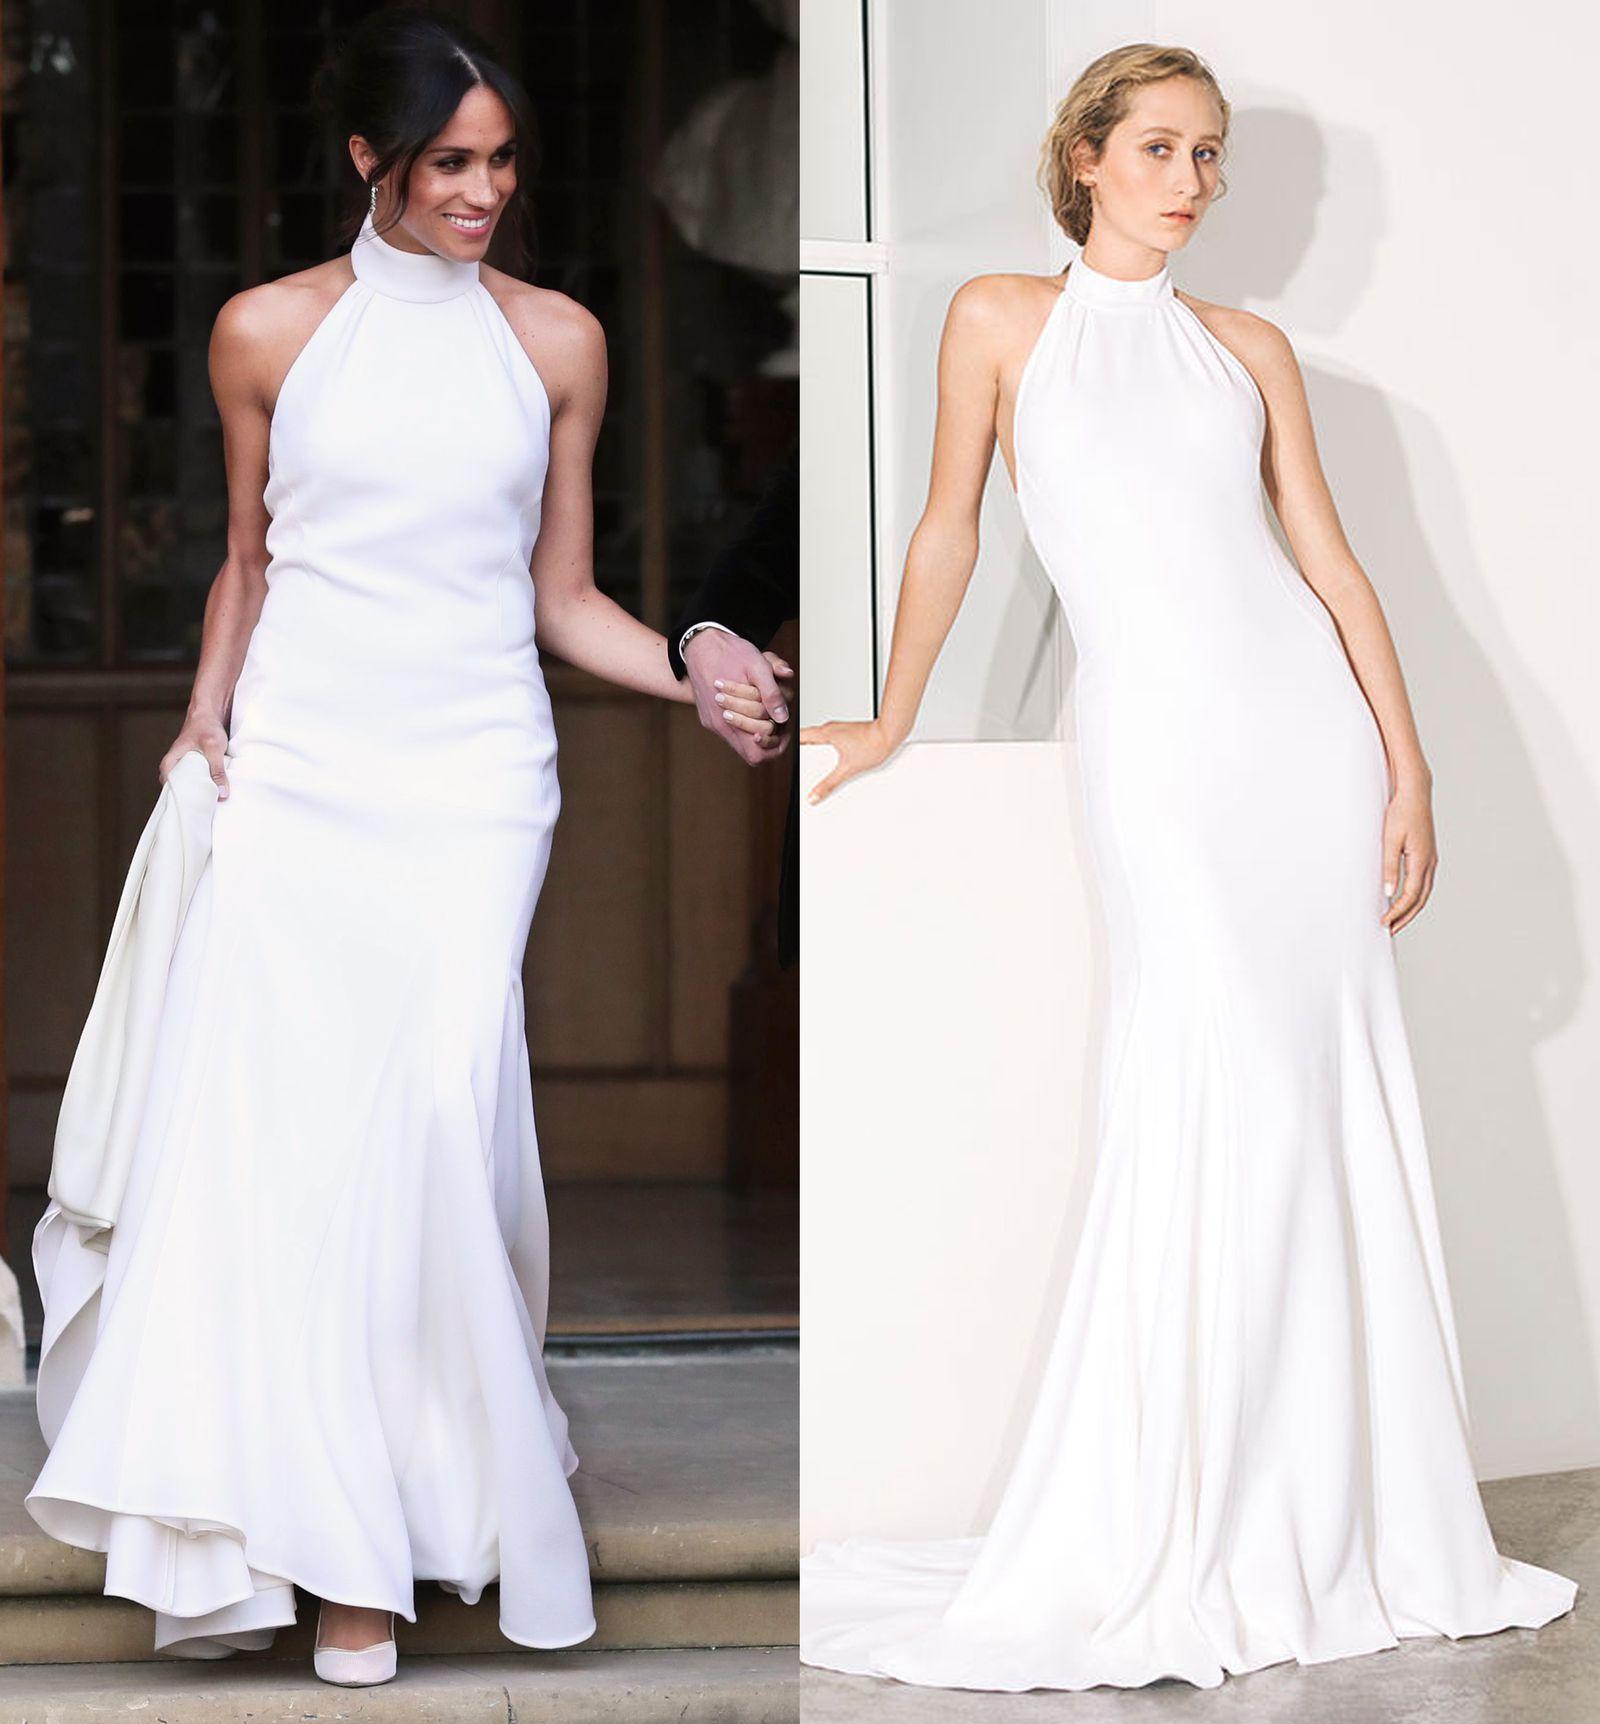 e086412d834b02 Stella McCartney's New Bridal Collection Includes Meghan Markle's Wedding  Dress